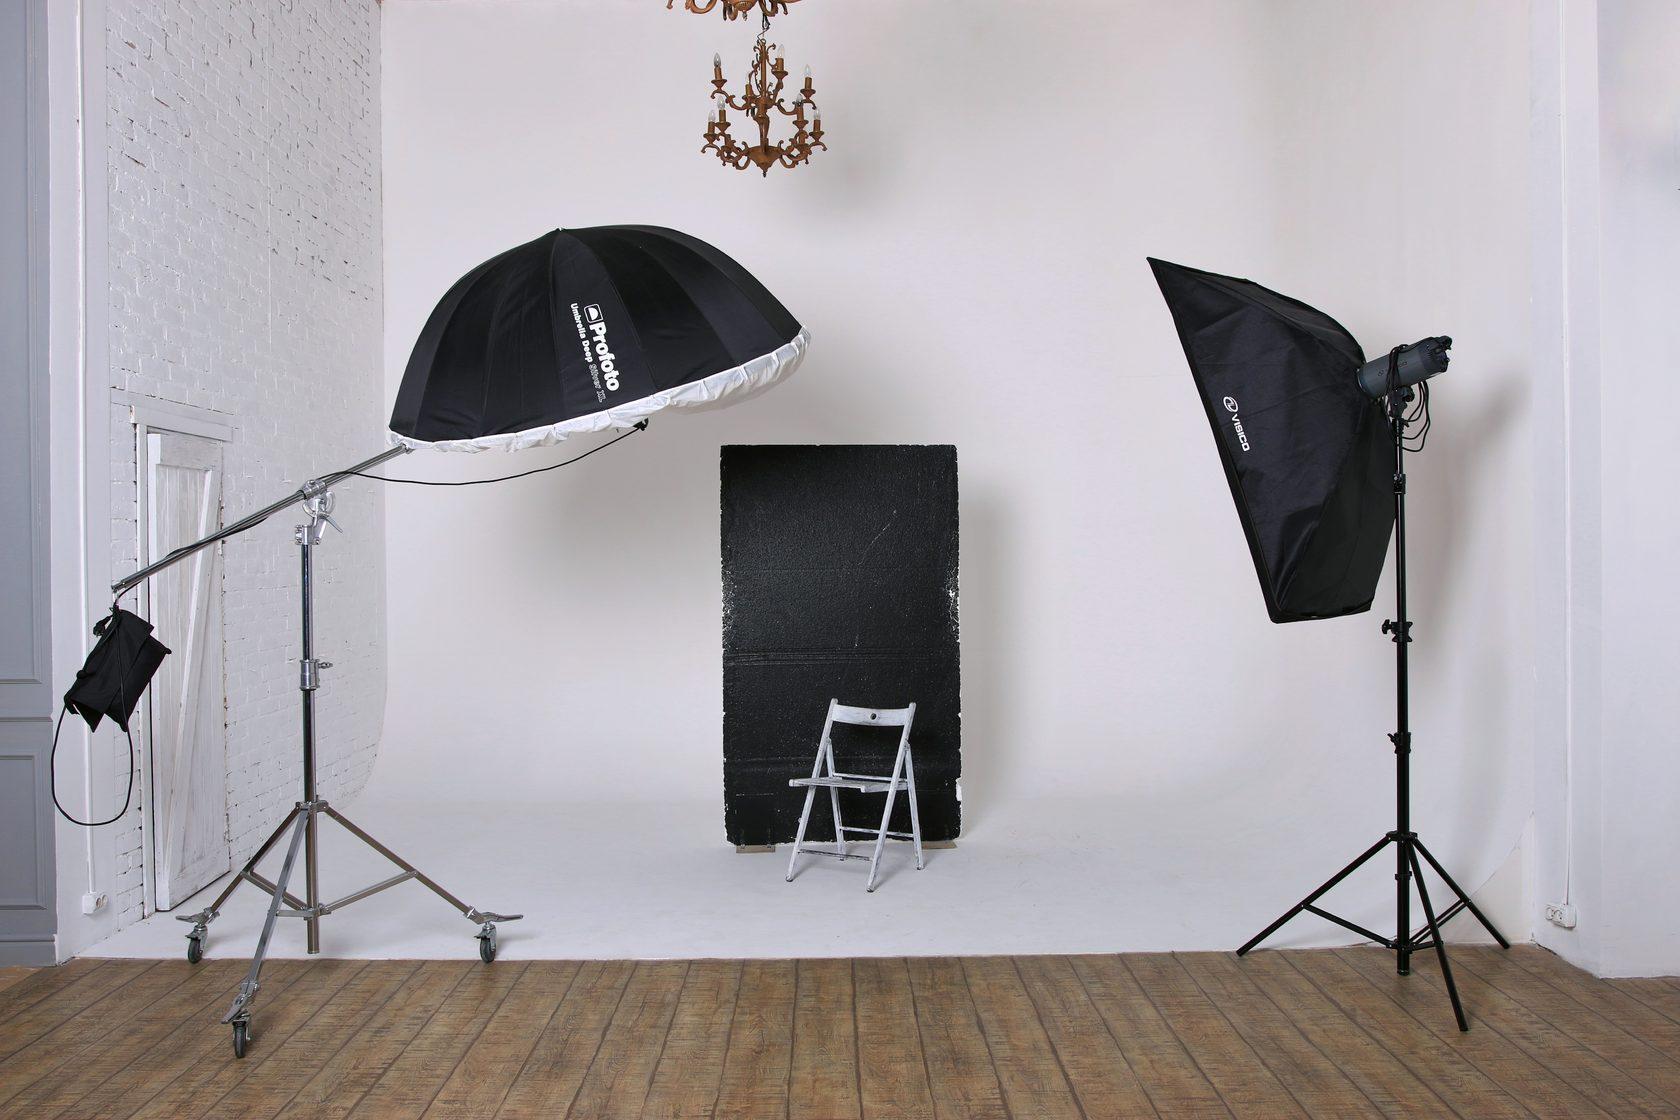 процедура даст аренда фотостудии под мероприятие москва год